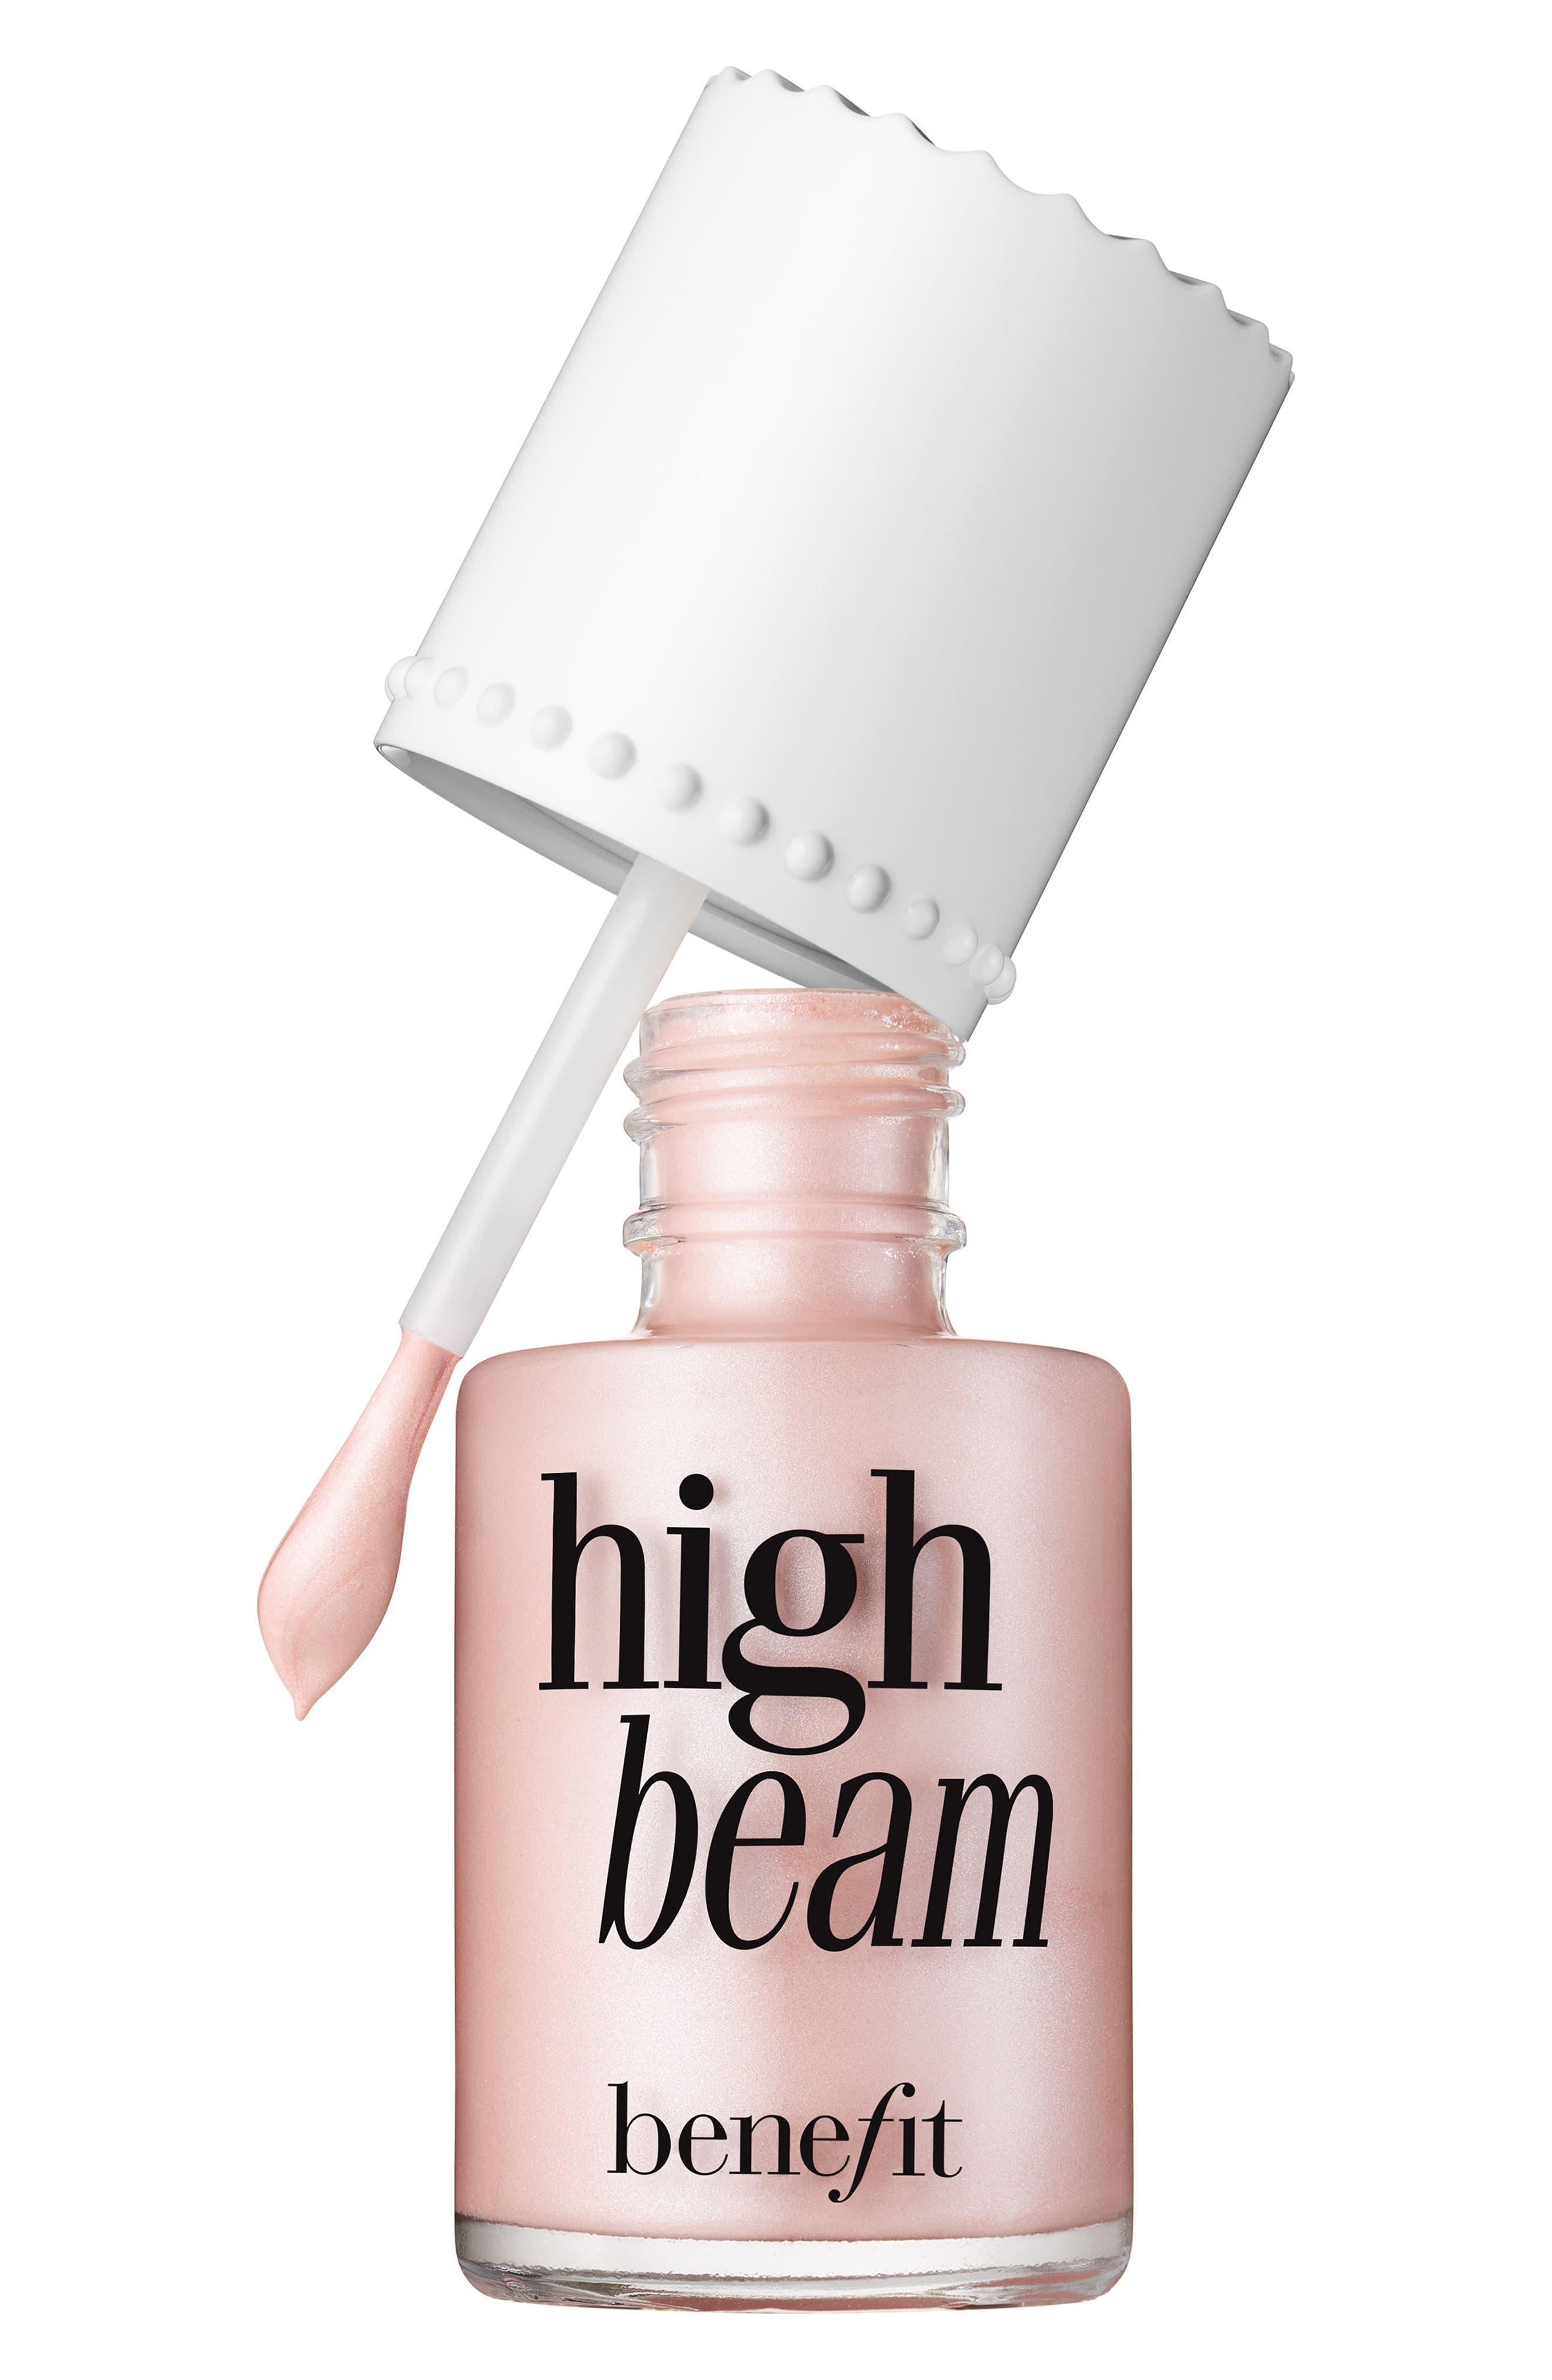 Alternate Image 1 Selected - Benefit High Beam Satiny Pink Liquid Highlighter